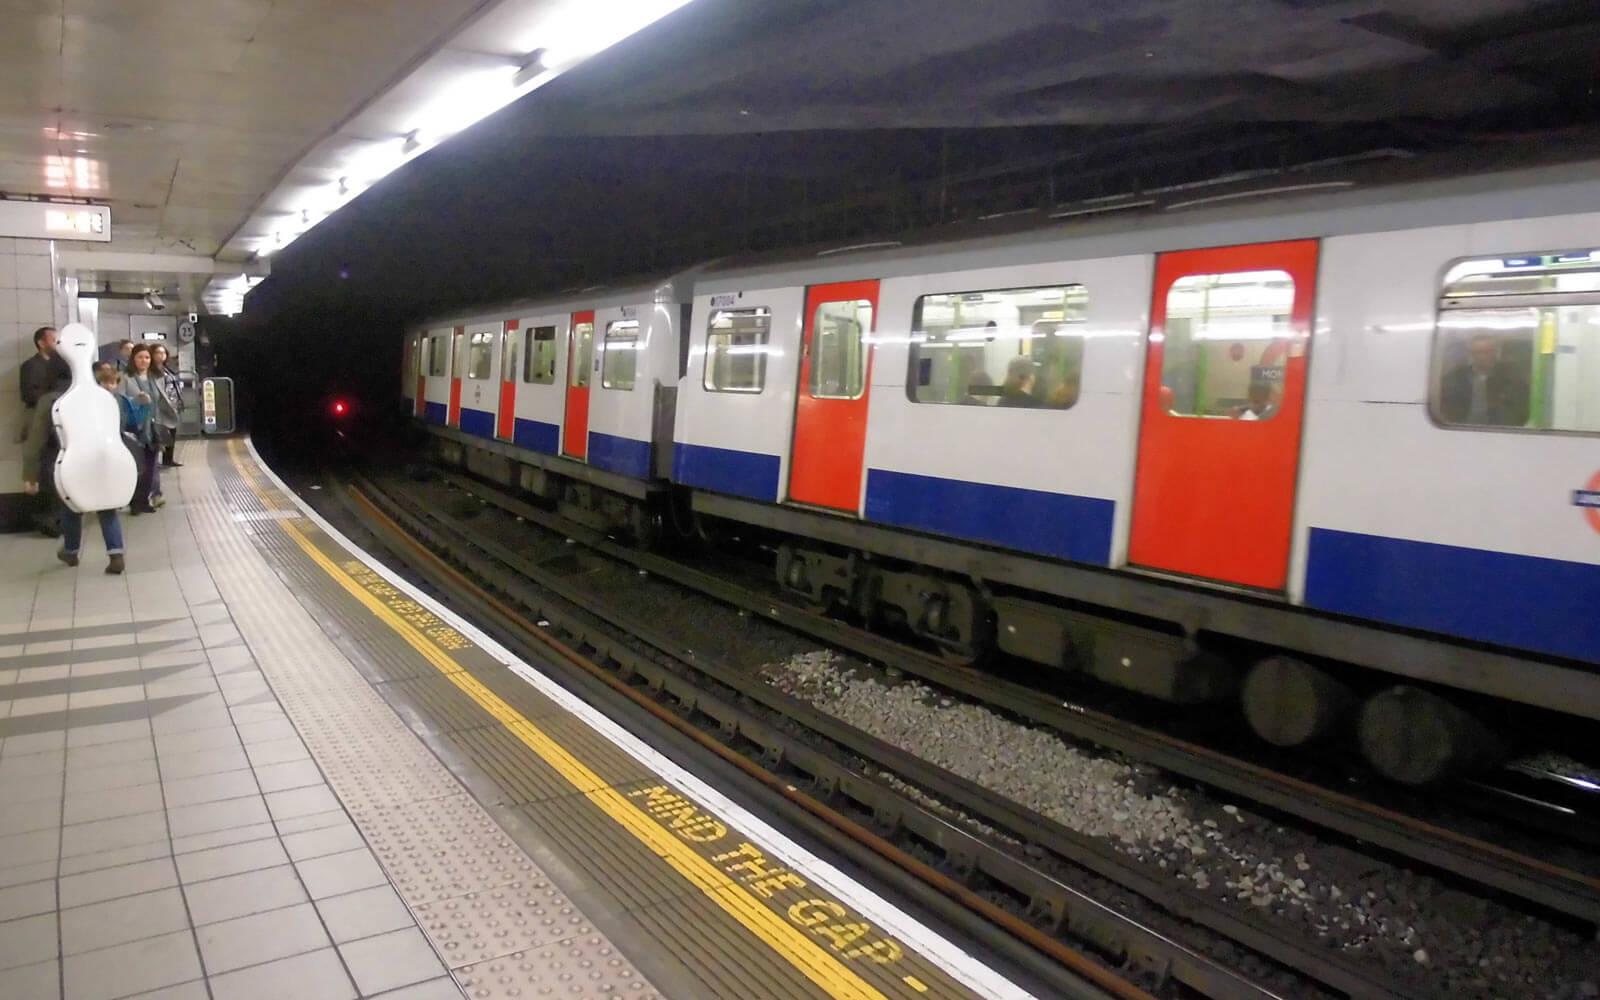 Mind the gap am Bahnsteig in London